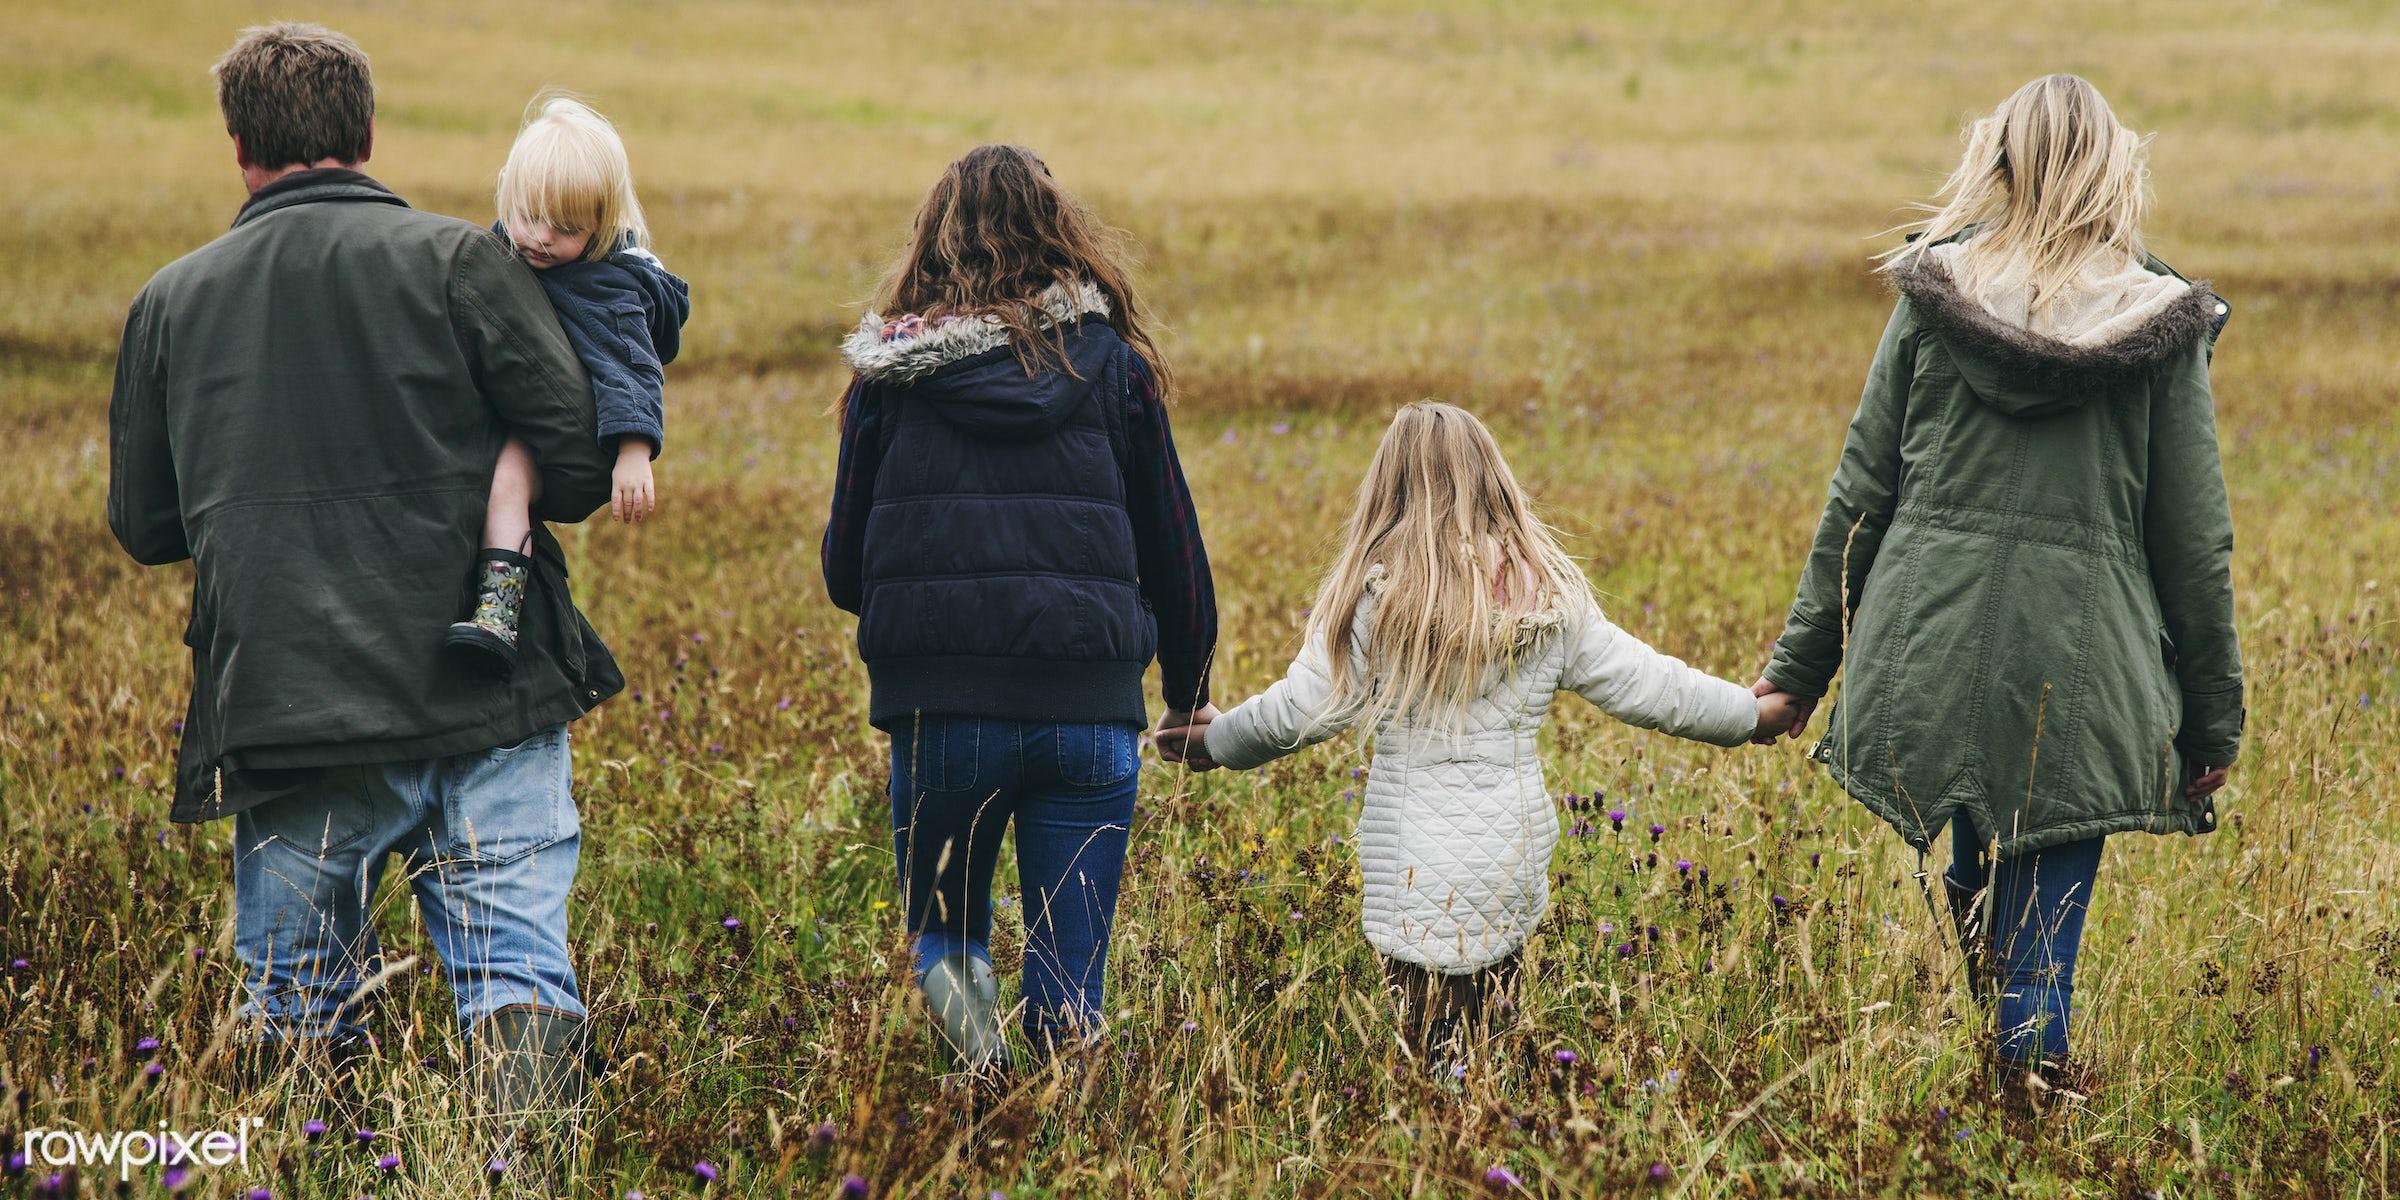 bonding, care, casual, childhood, children, daughter, enjoyment, environment, environmental, family, father, field, girl,...